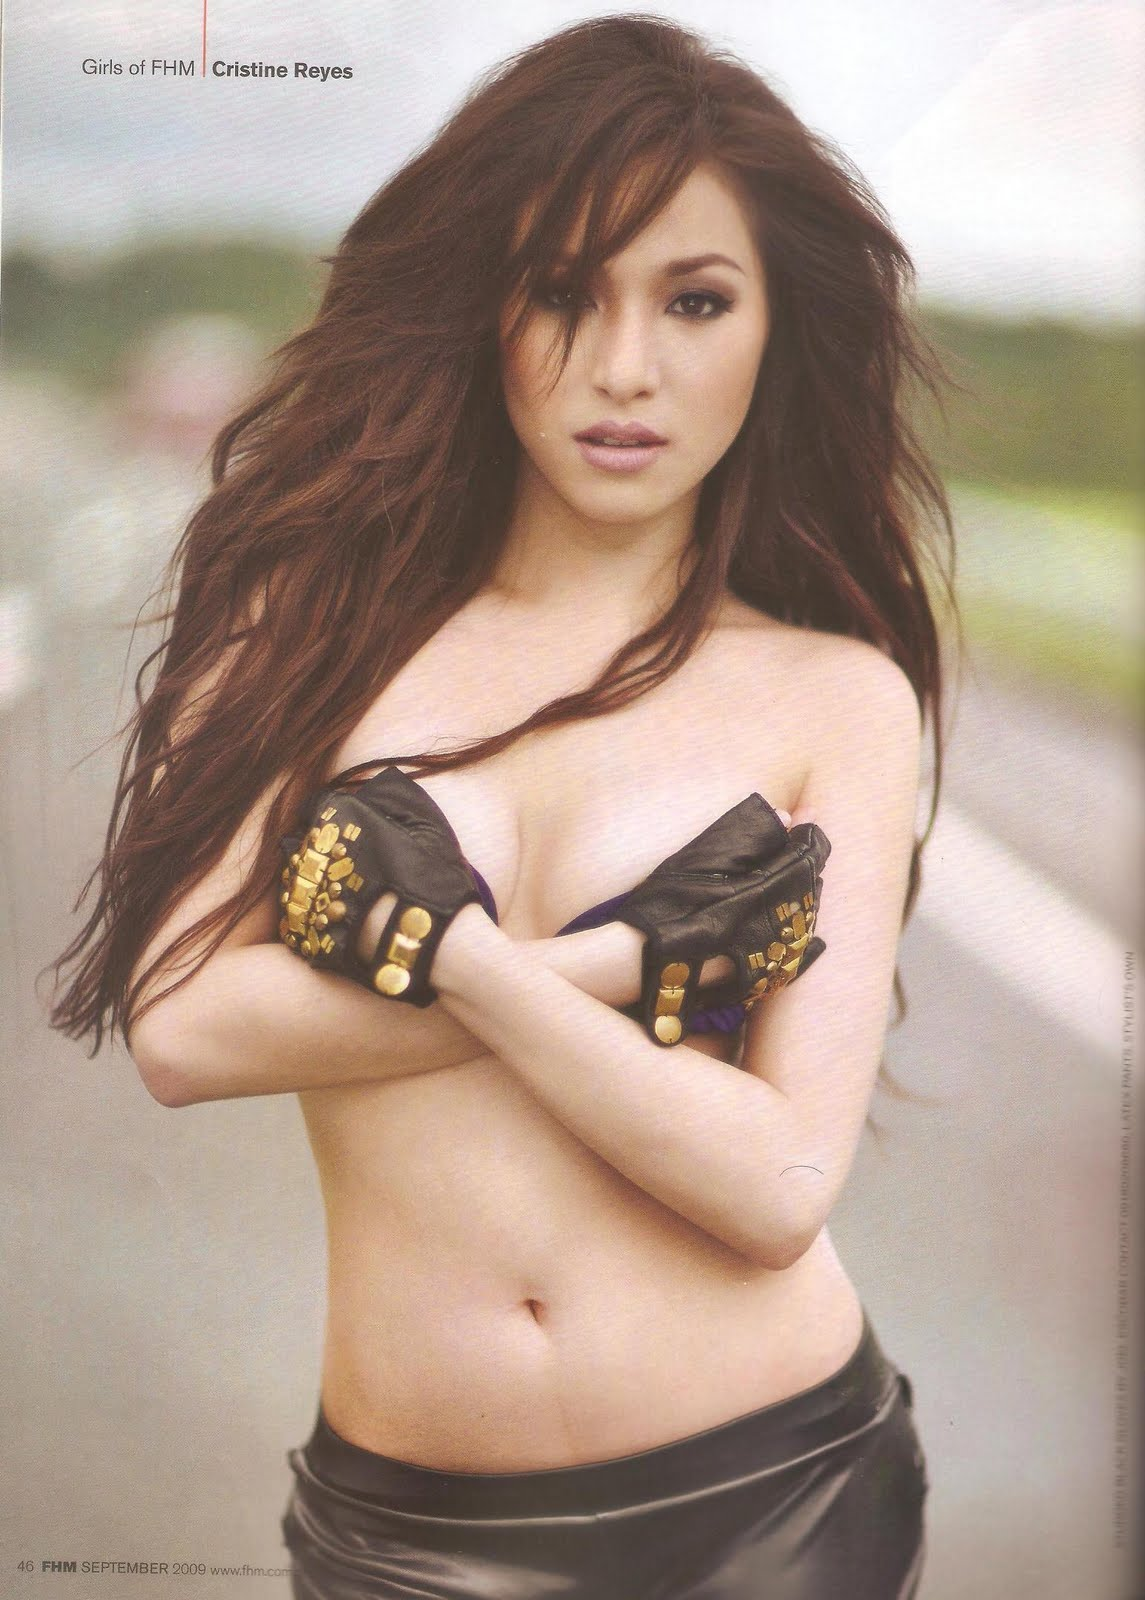 Cristine Reyes - 2008 FHM Calendar